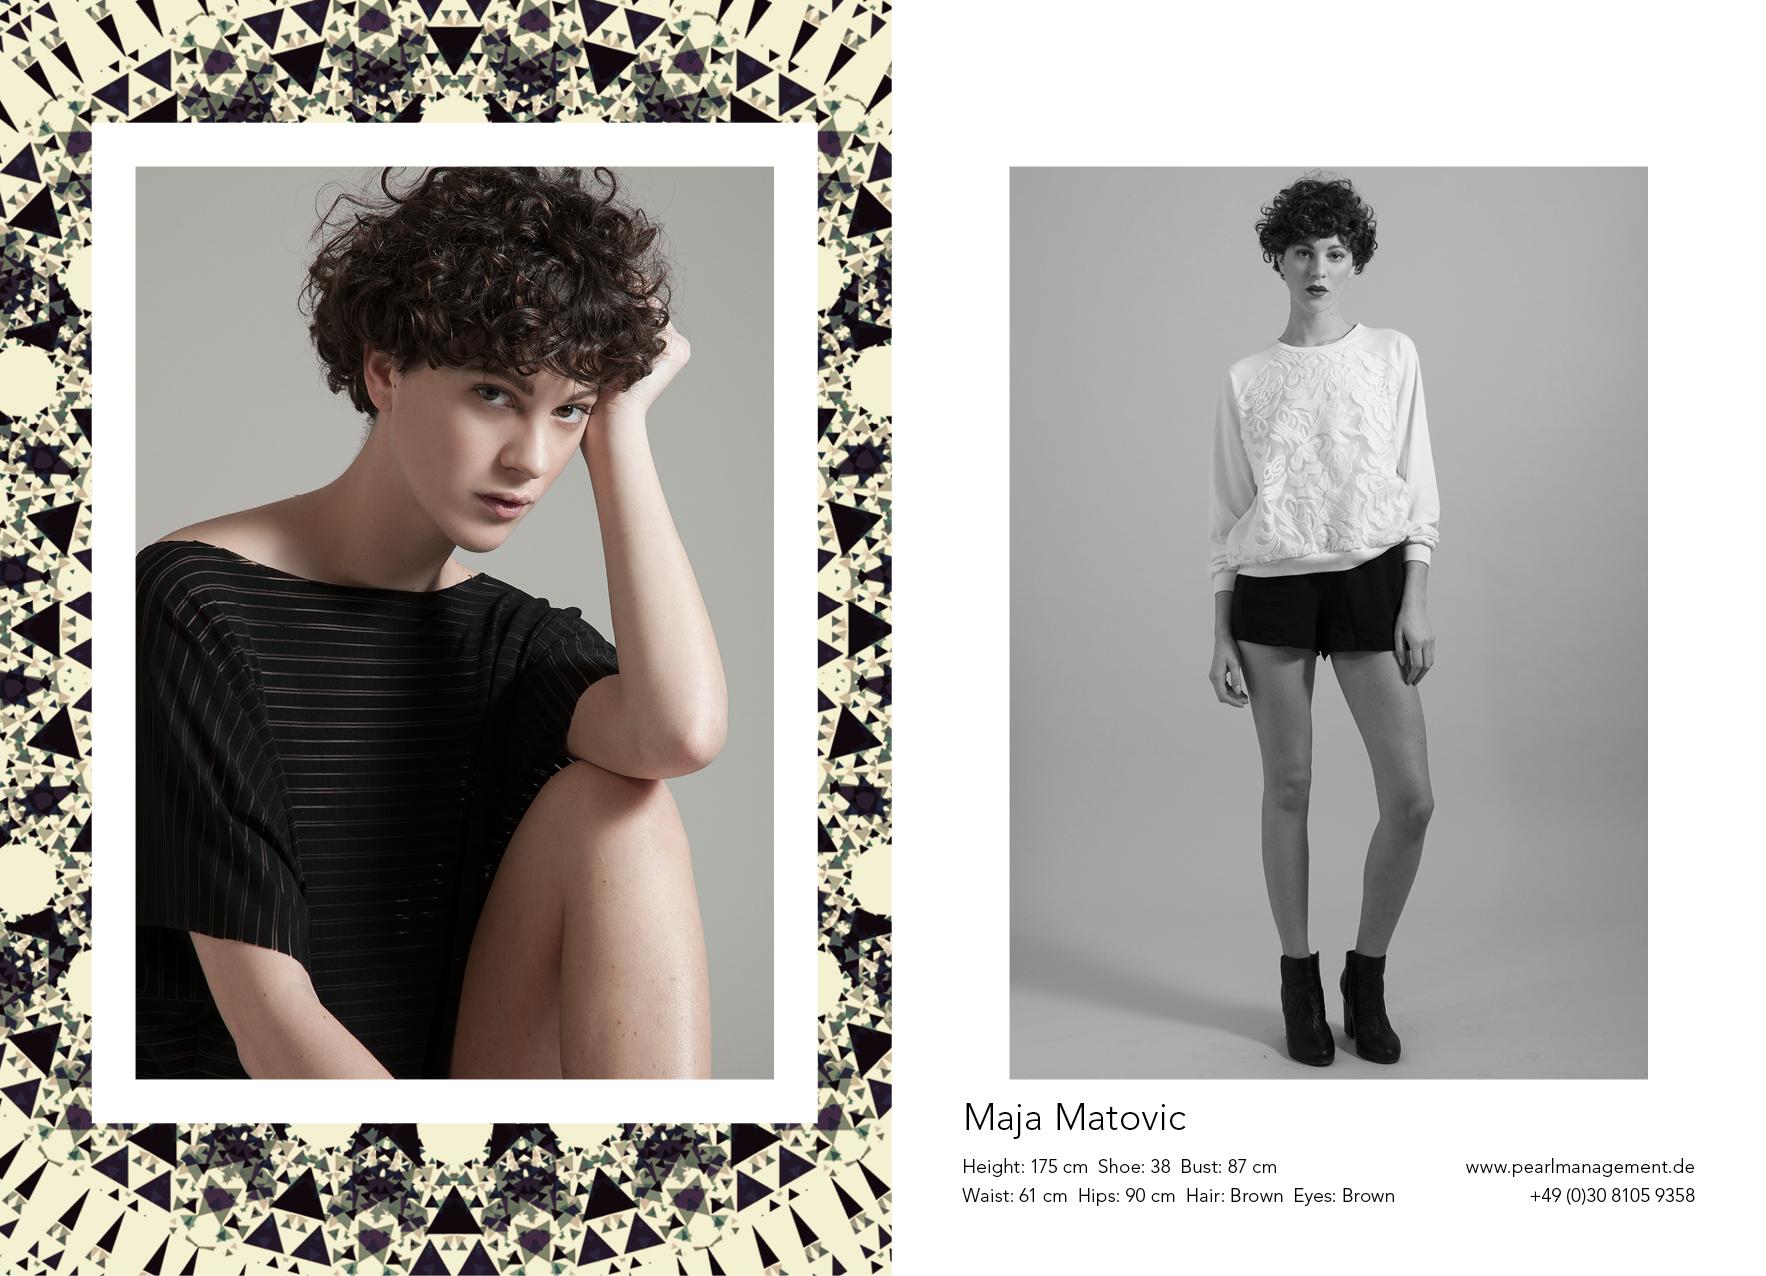 Maja Matovic.jpg